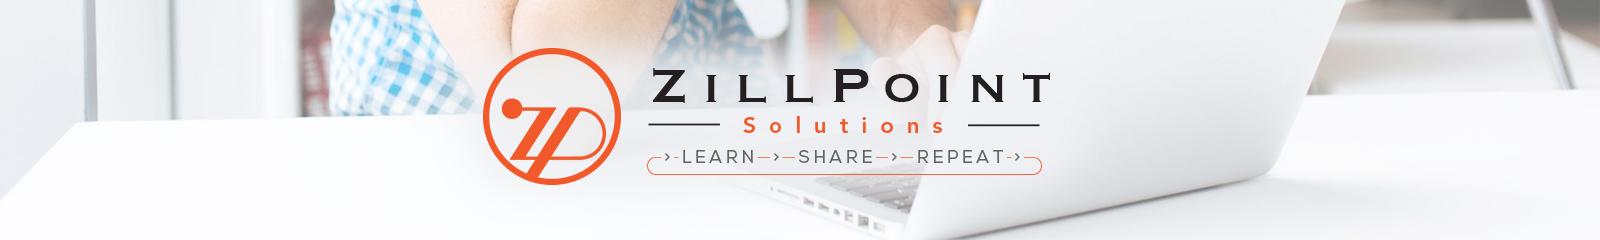 zillpoint.com